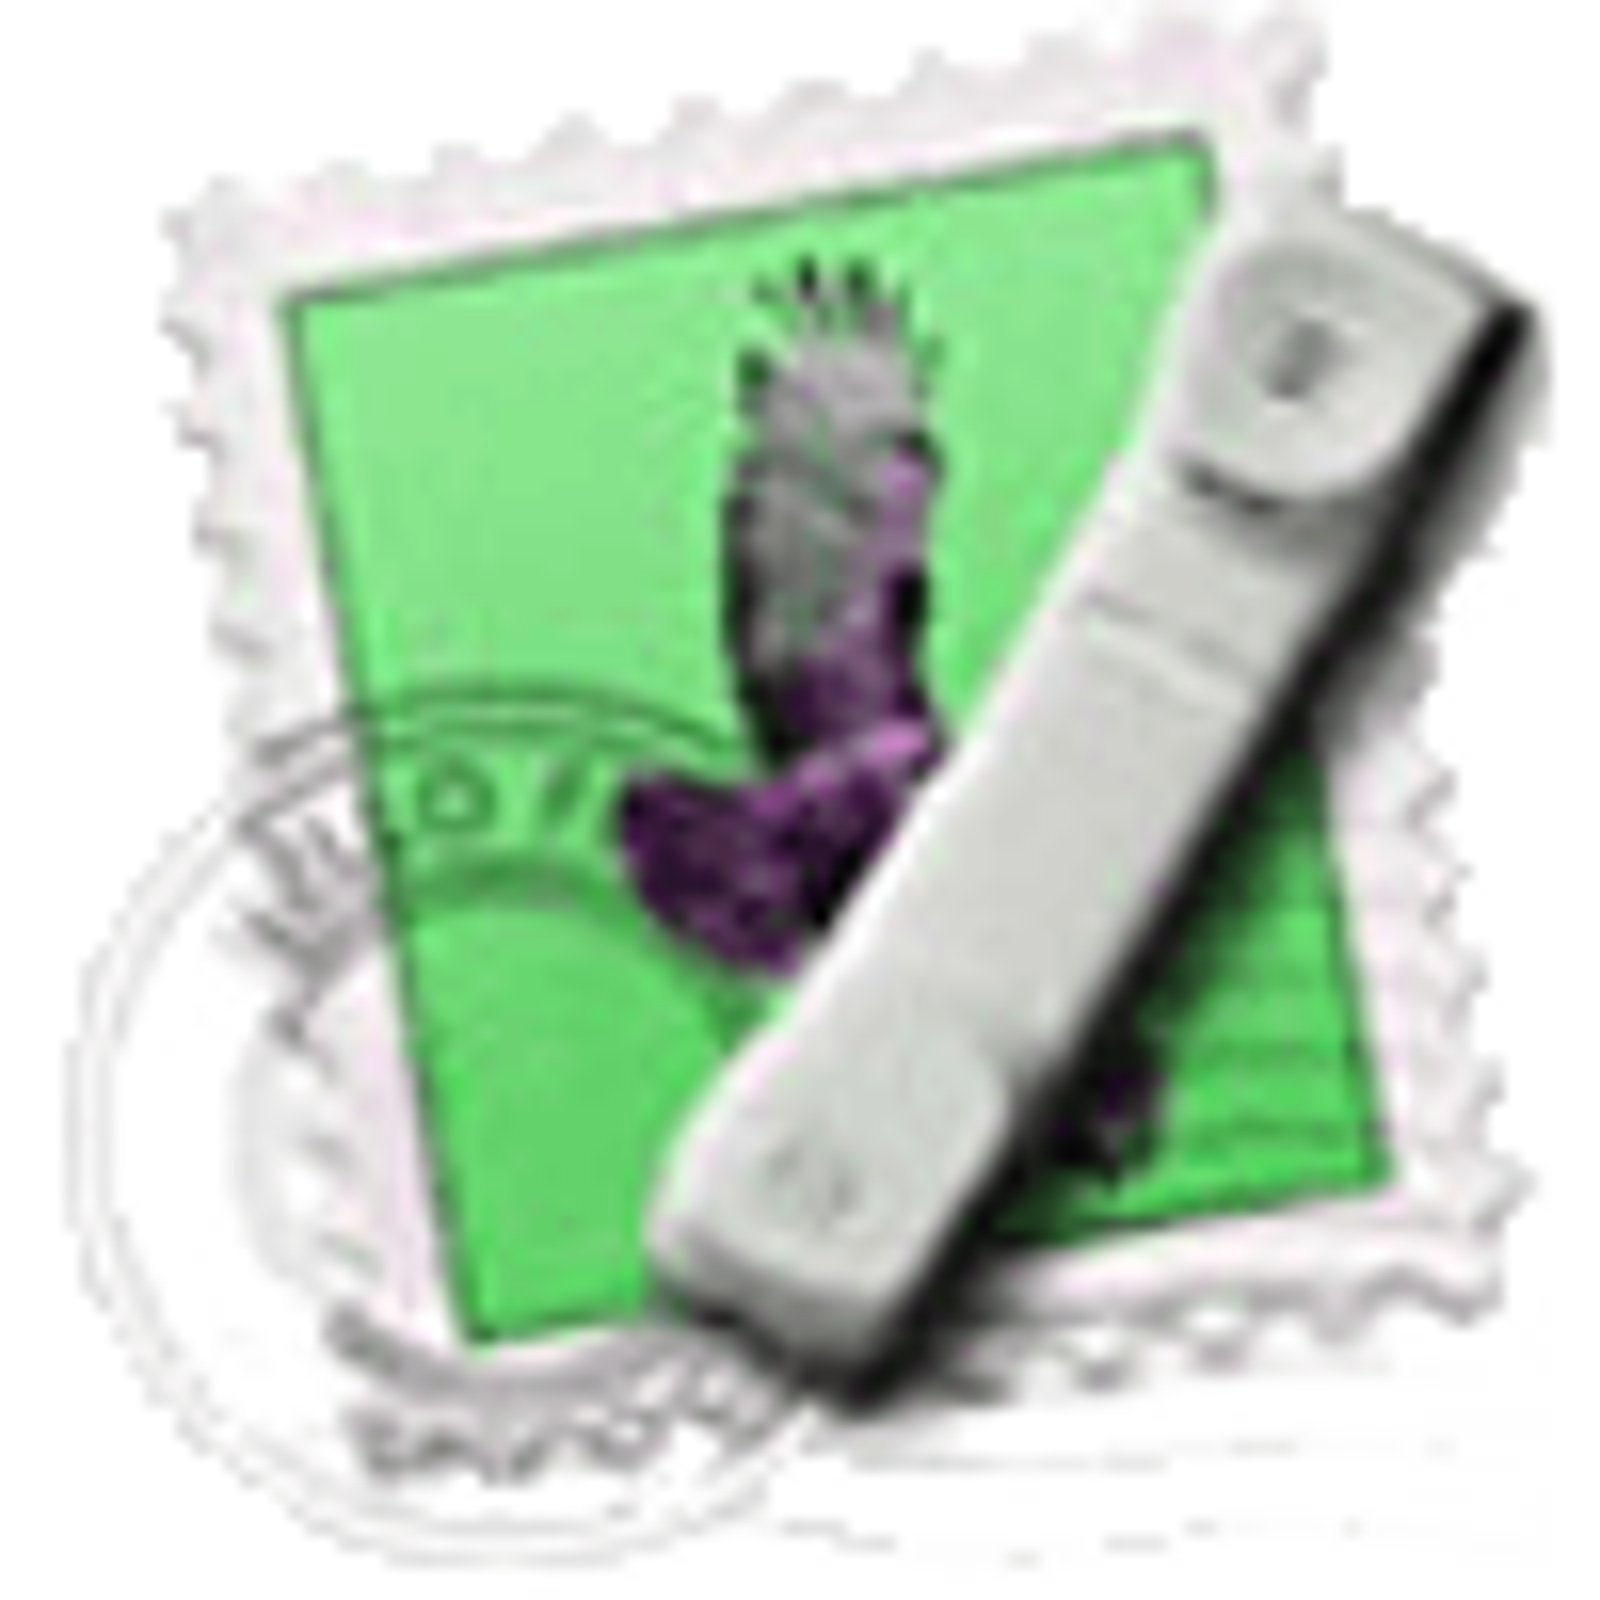 MacResponder 1.5.1